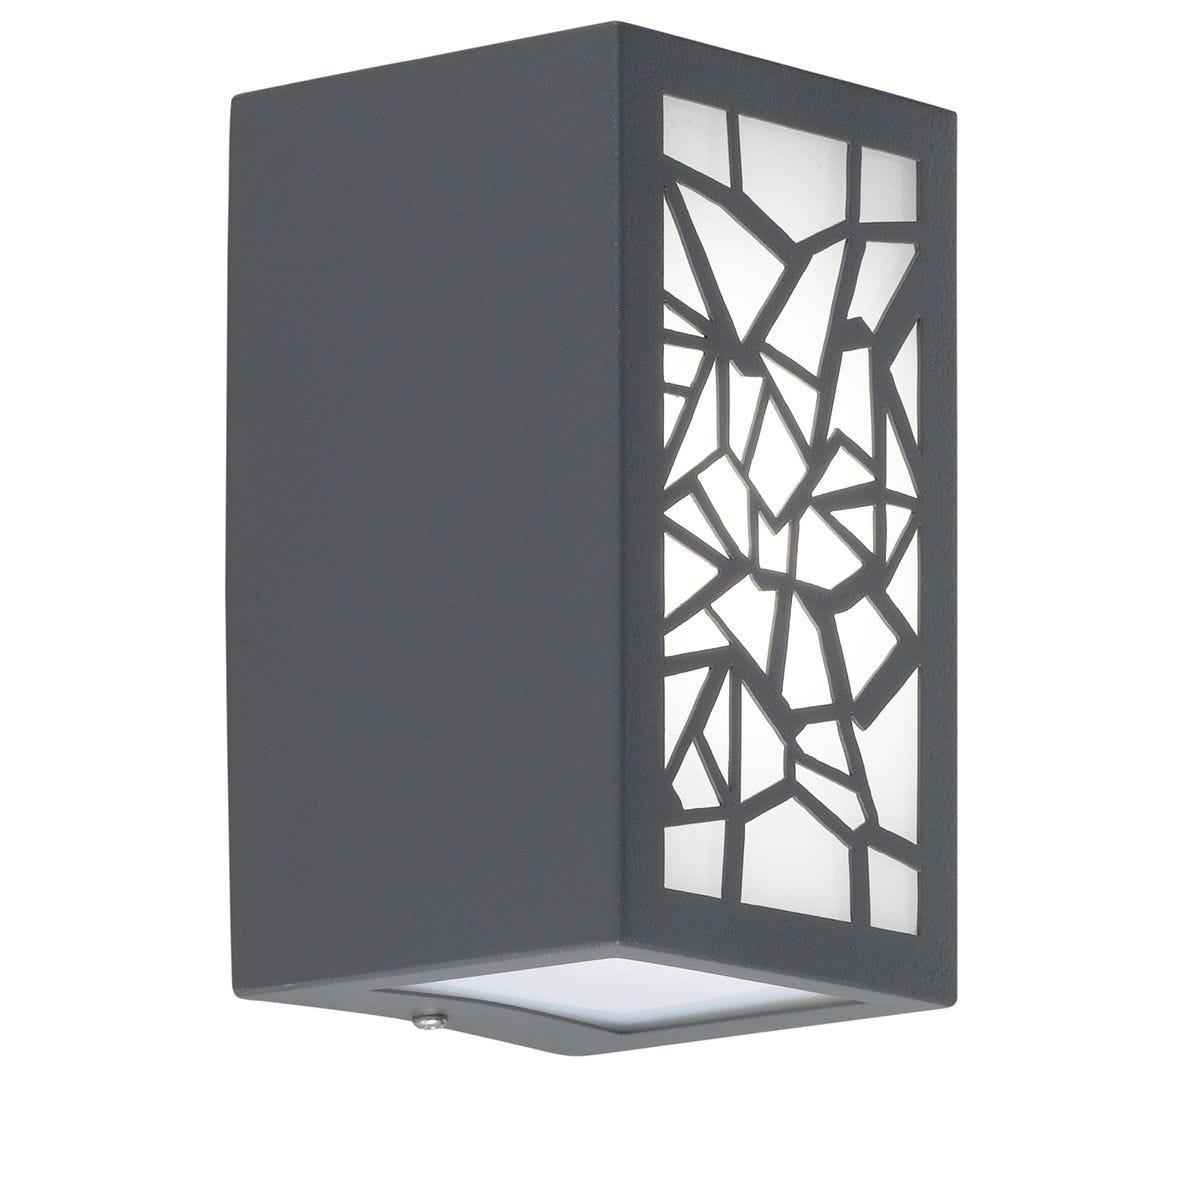 Wofi Padua Wall Lamp - Angular Design